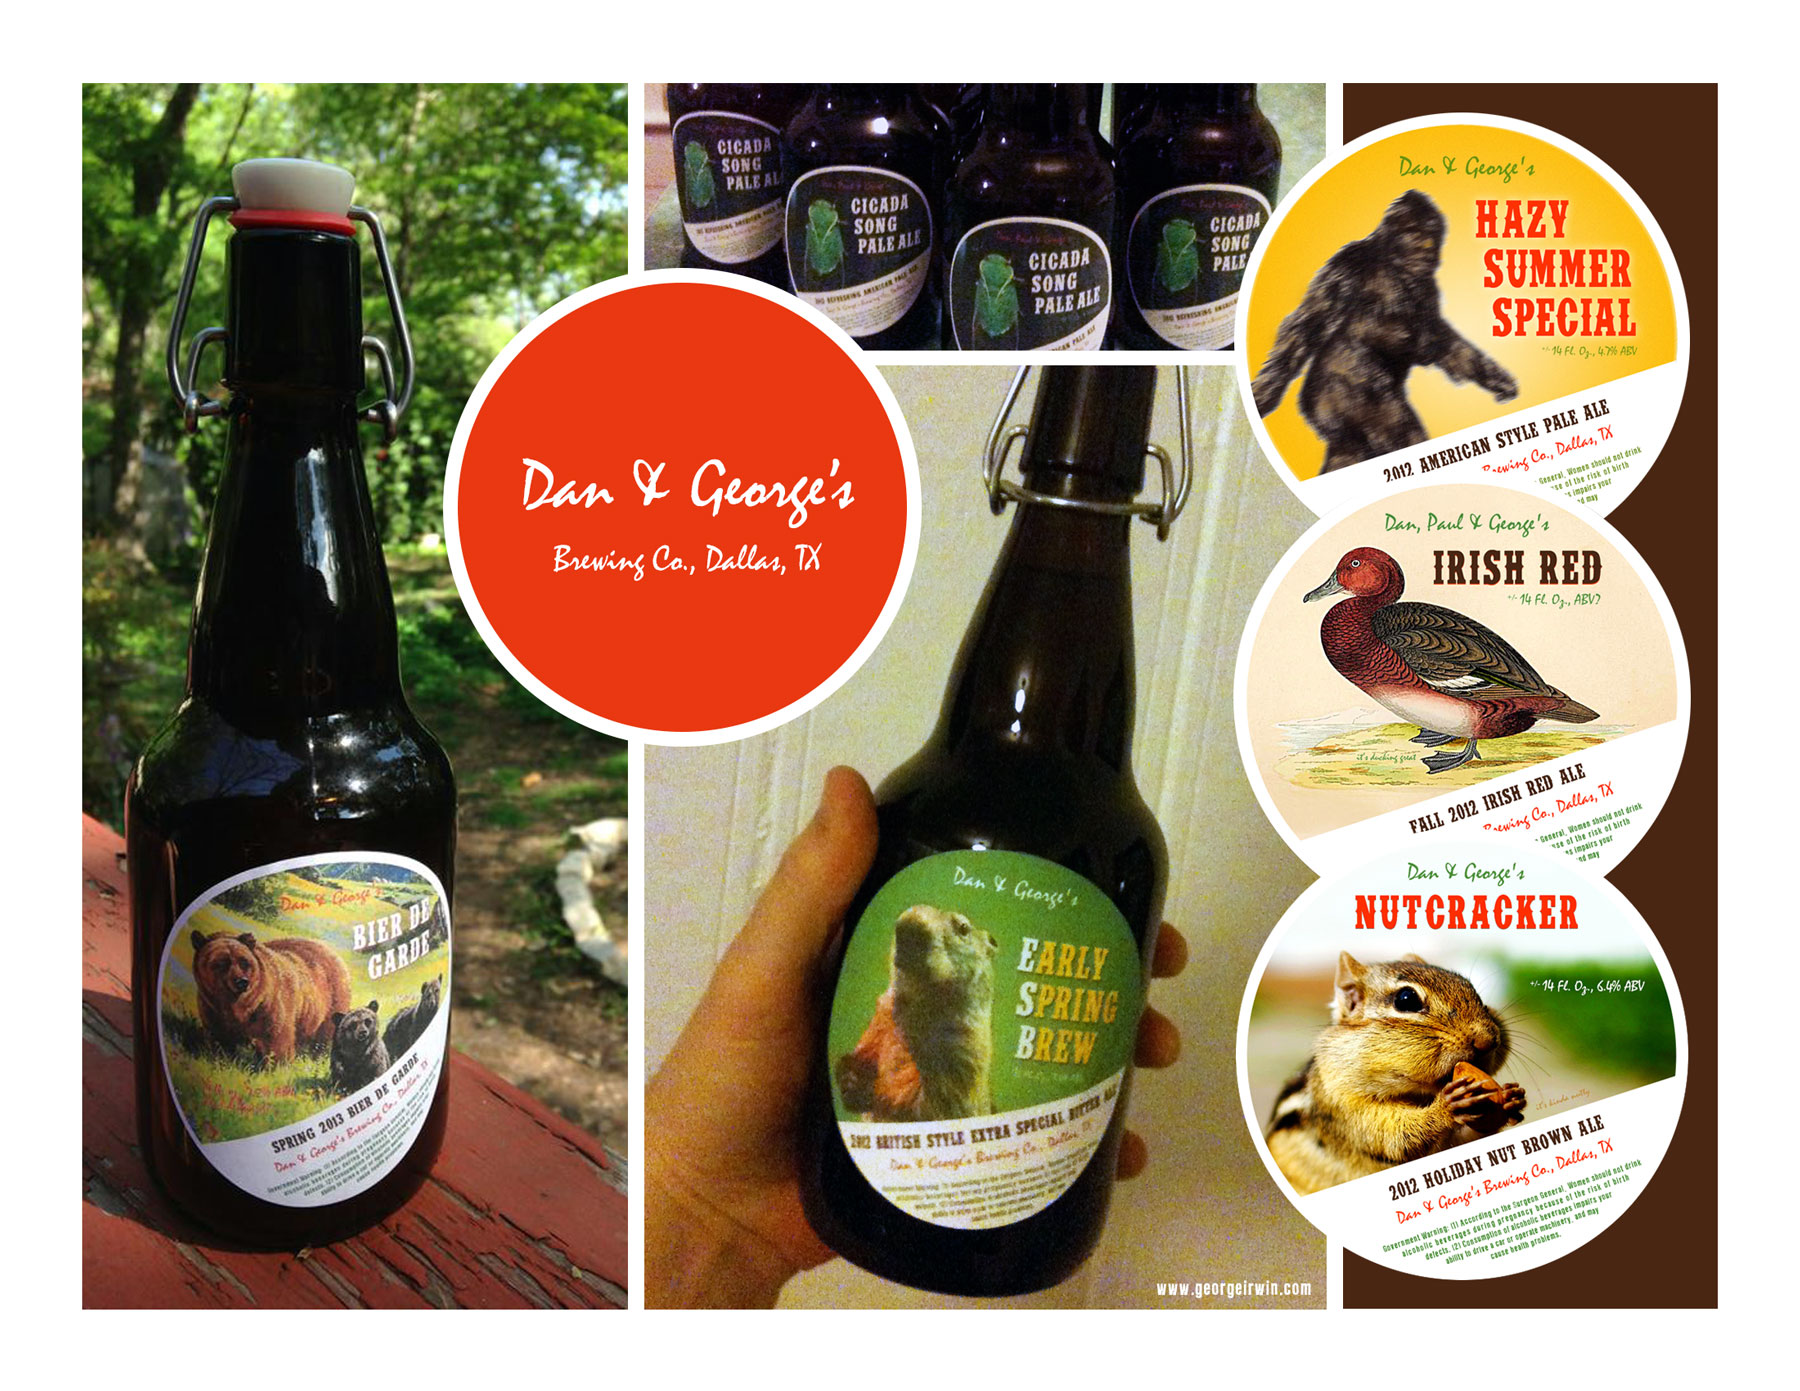 Dan + George's Brewing